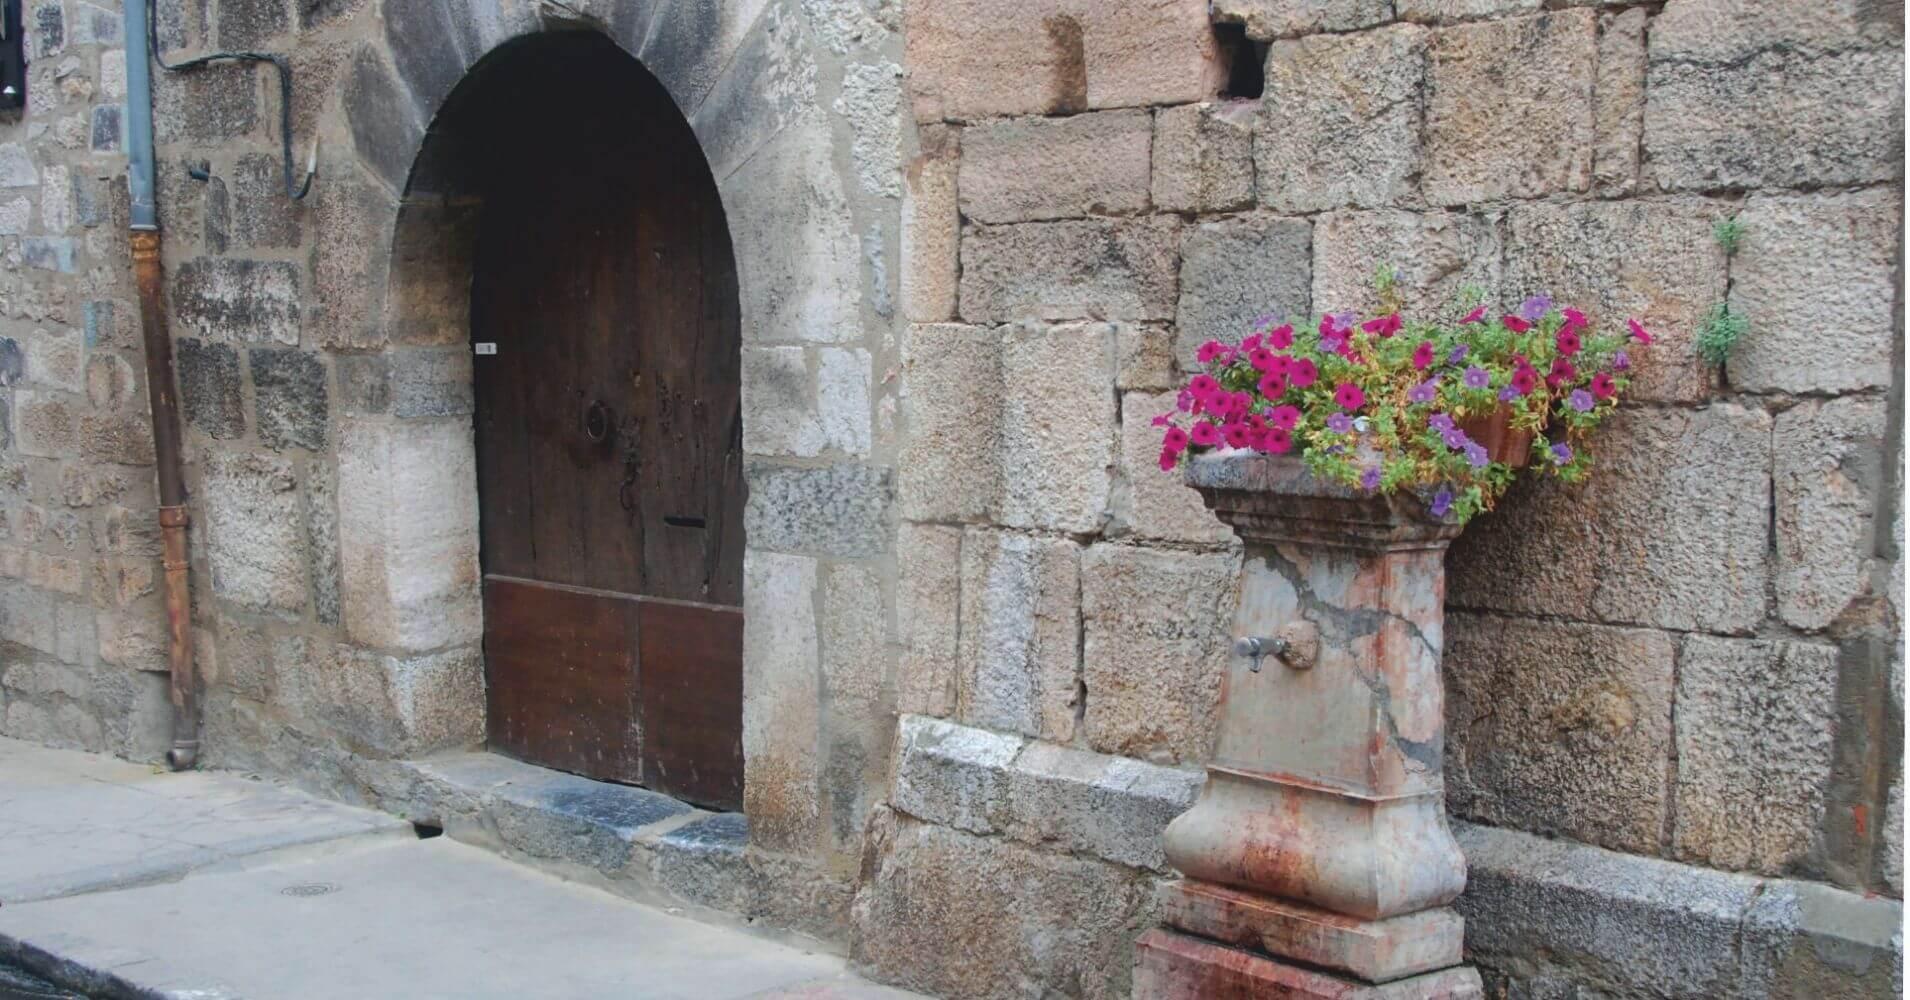 Detalles de la Villa. Languedoc-Rosellón. Pirineos Orientales, Occitania. Francia.